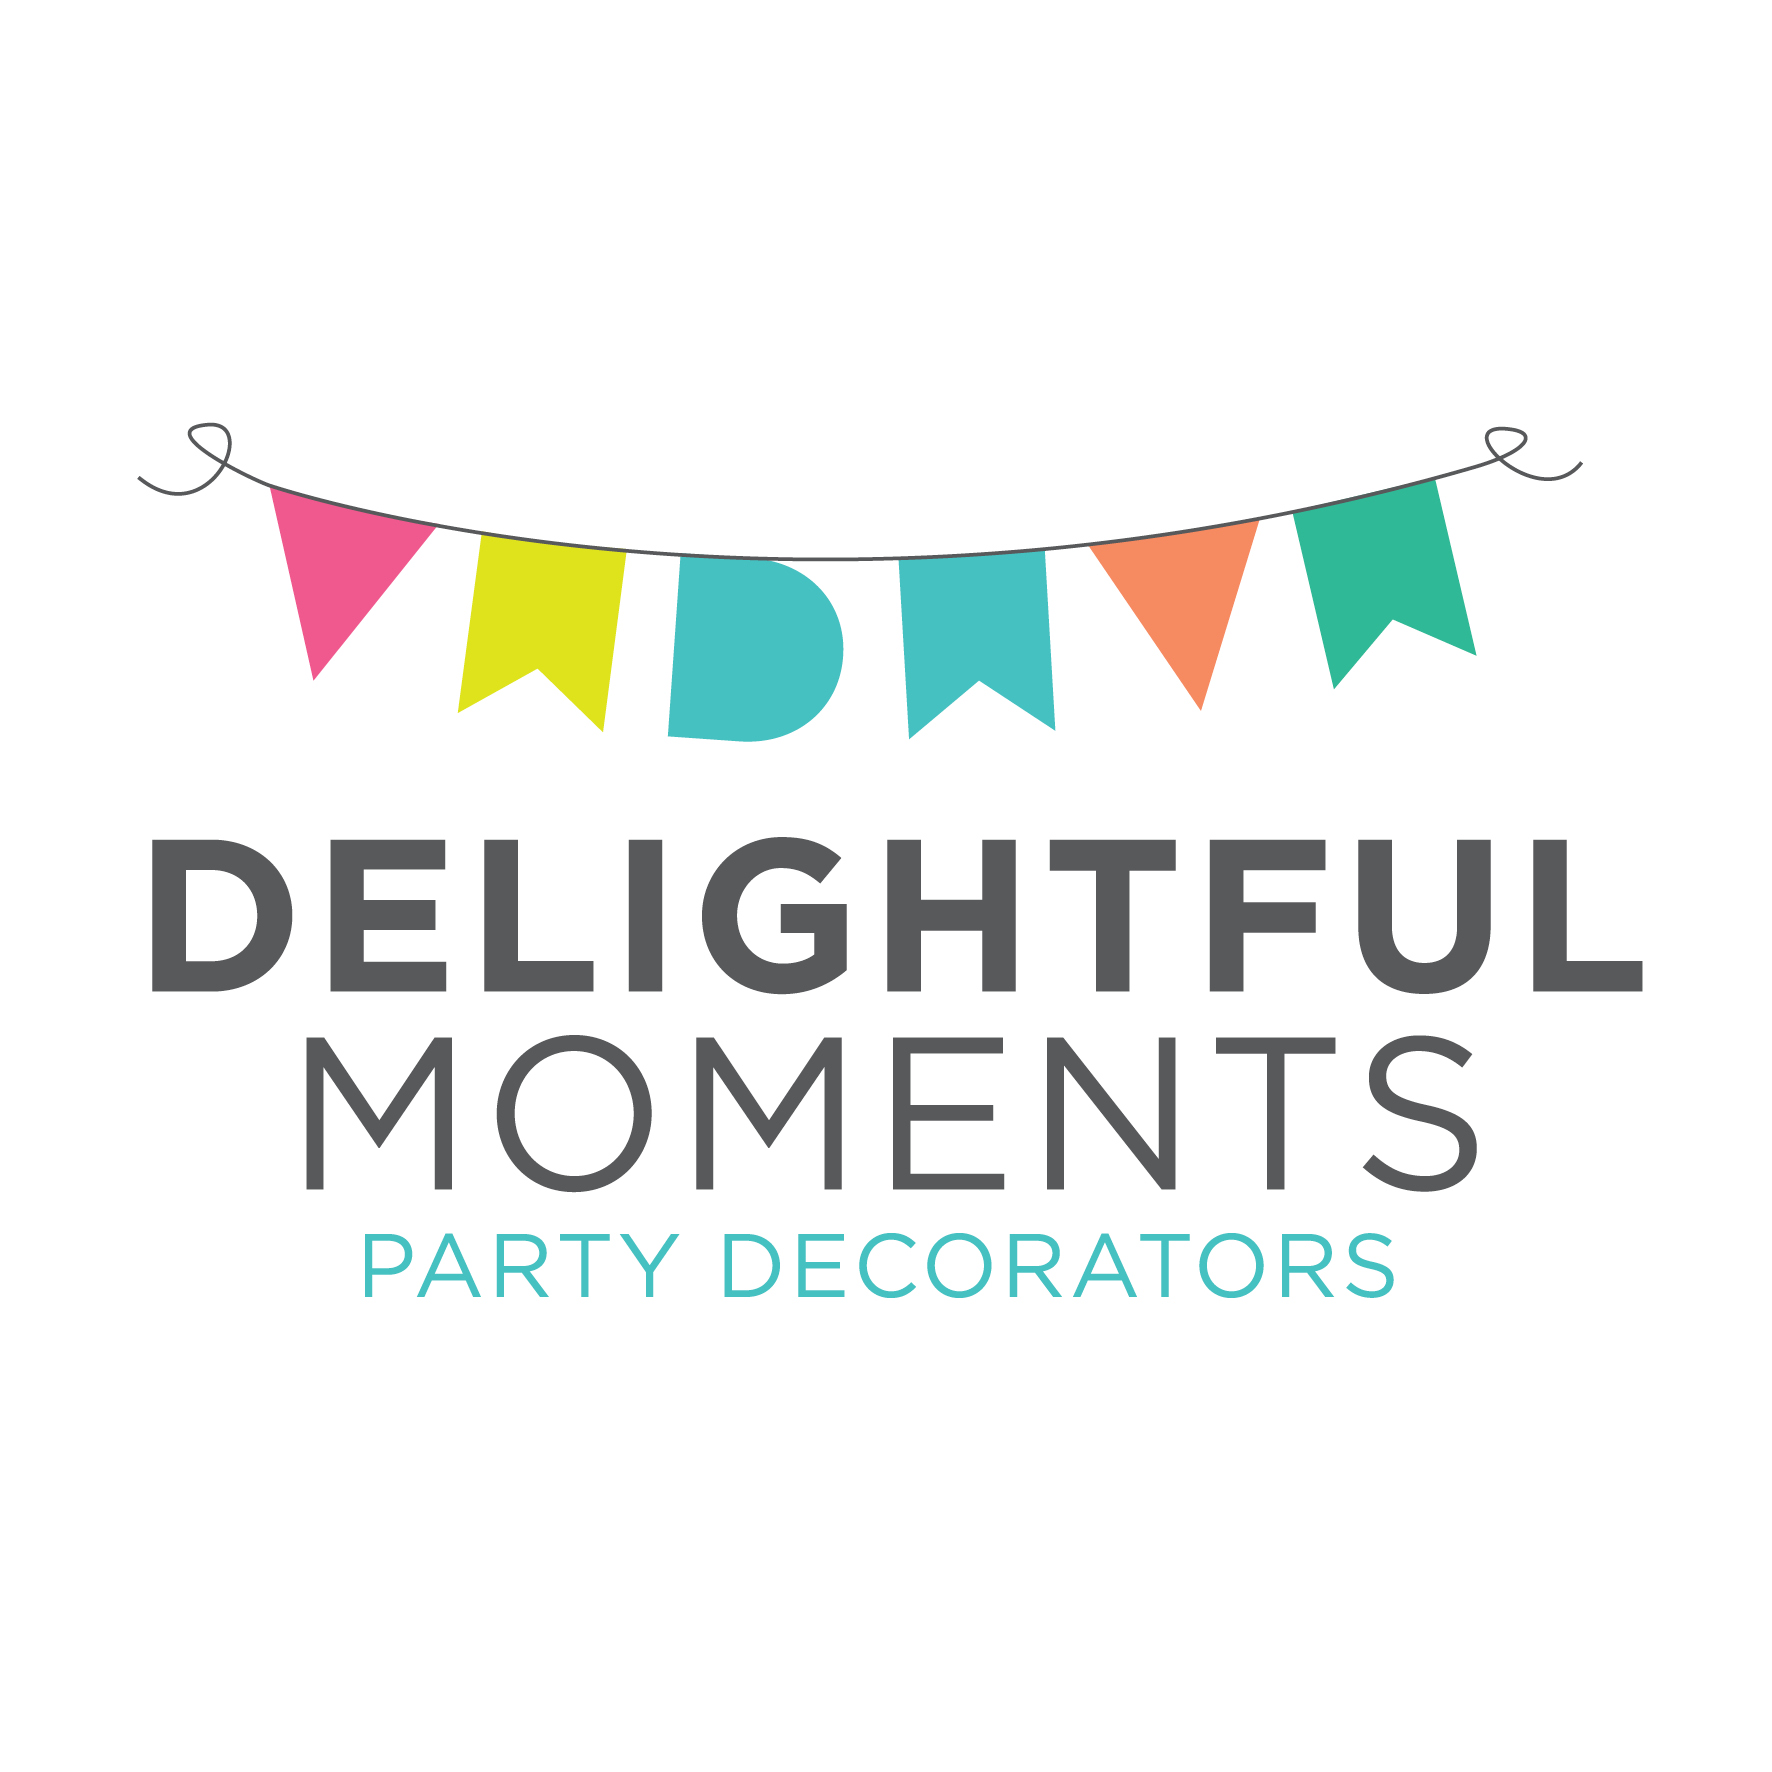 Delightful Moments